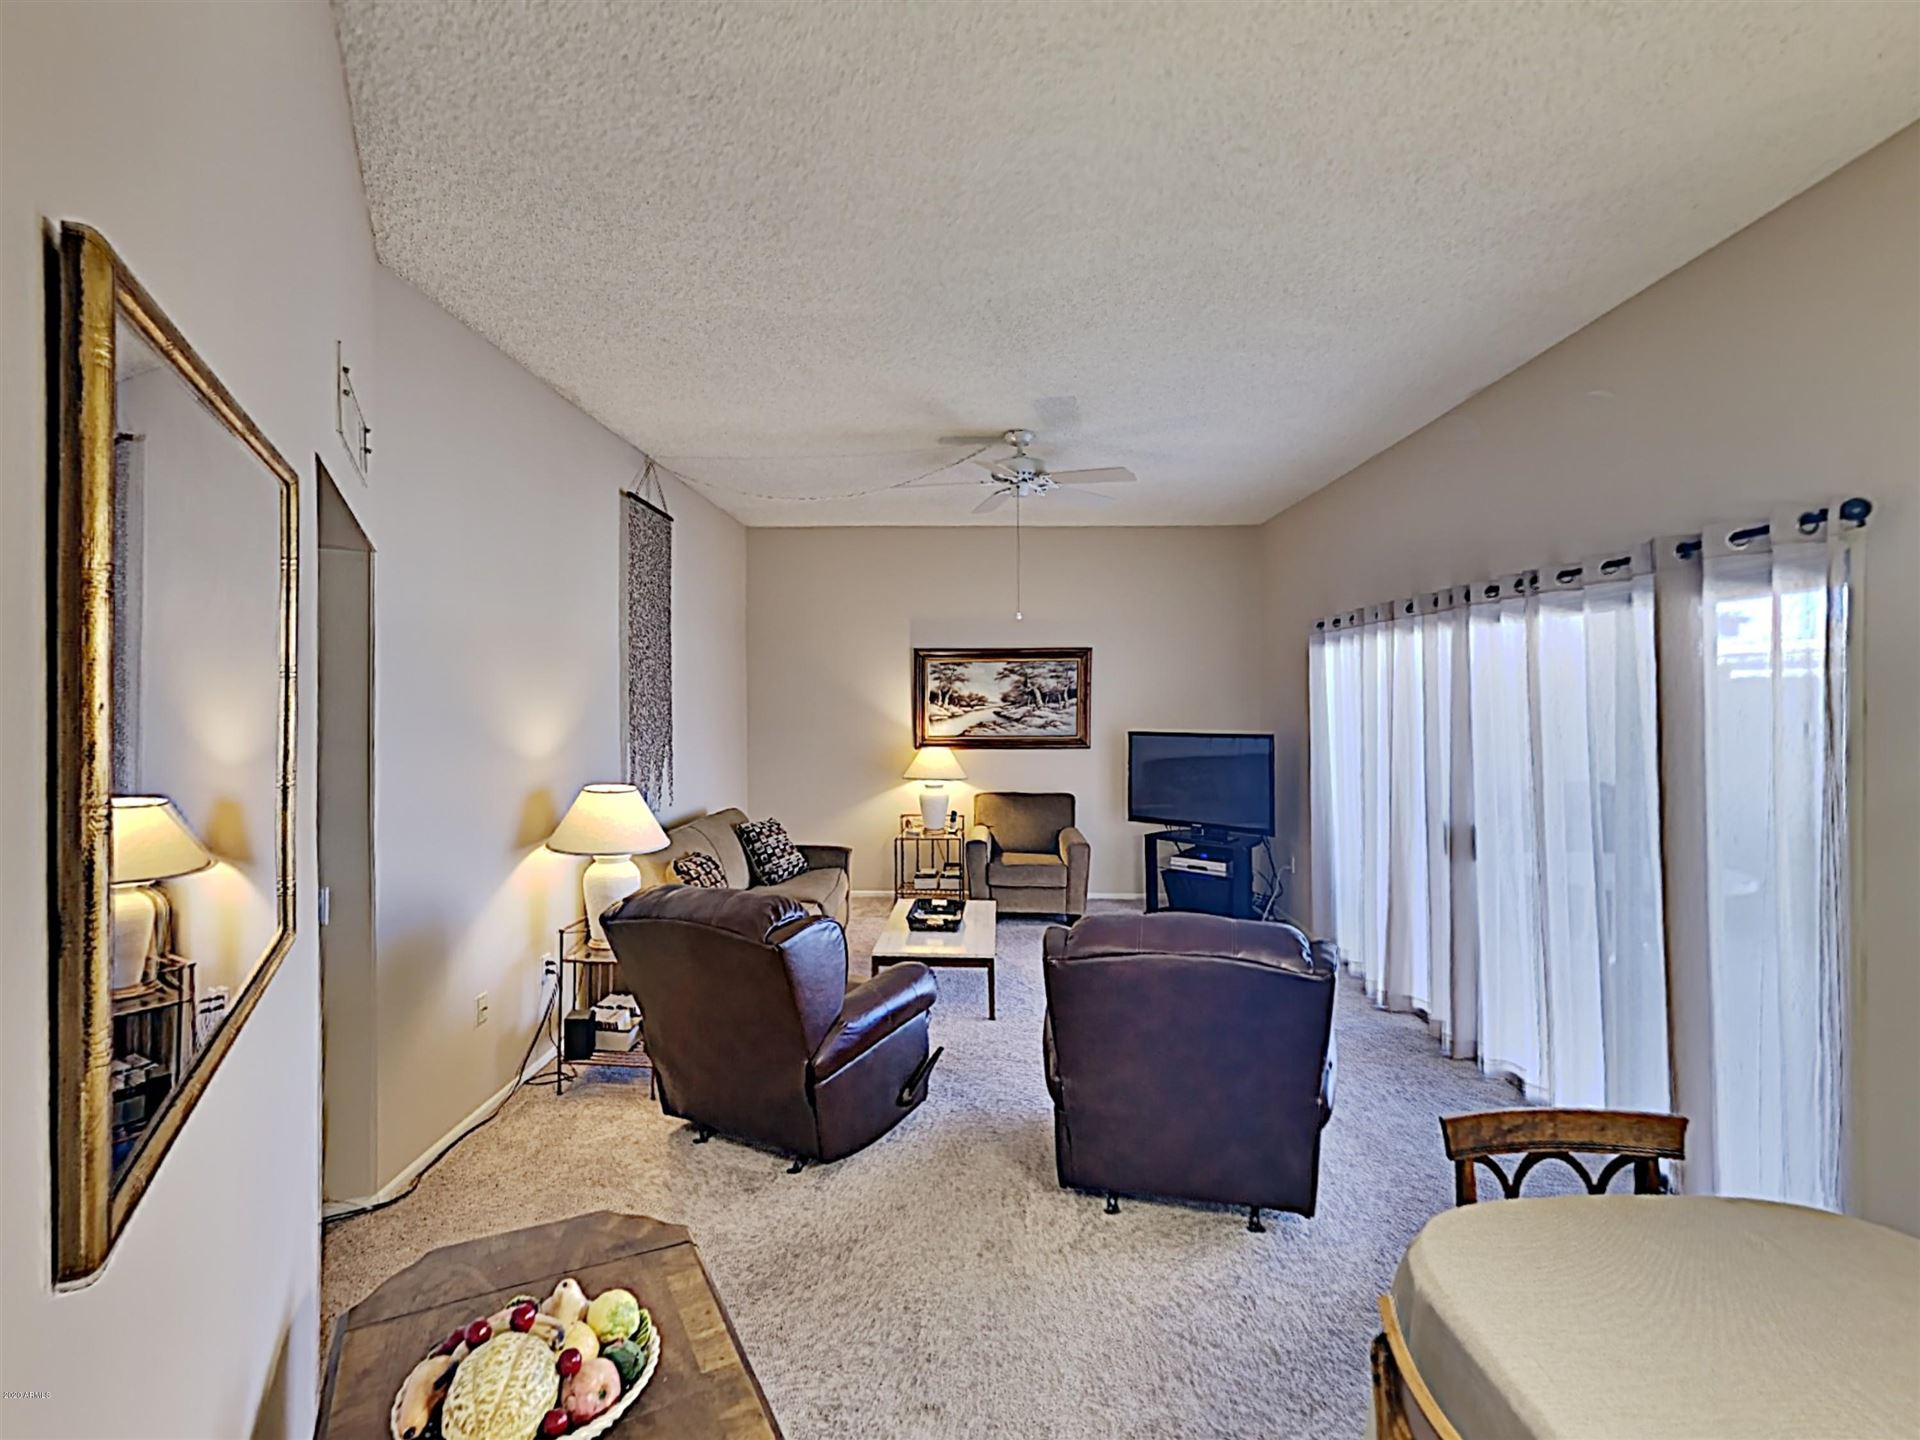 Photo of 16842 N Boswell Boulevard, Sun City, AZ 85351 (MLS # 6268110)